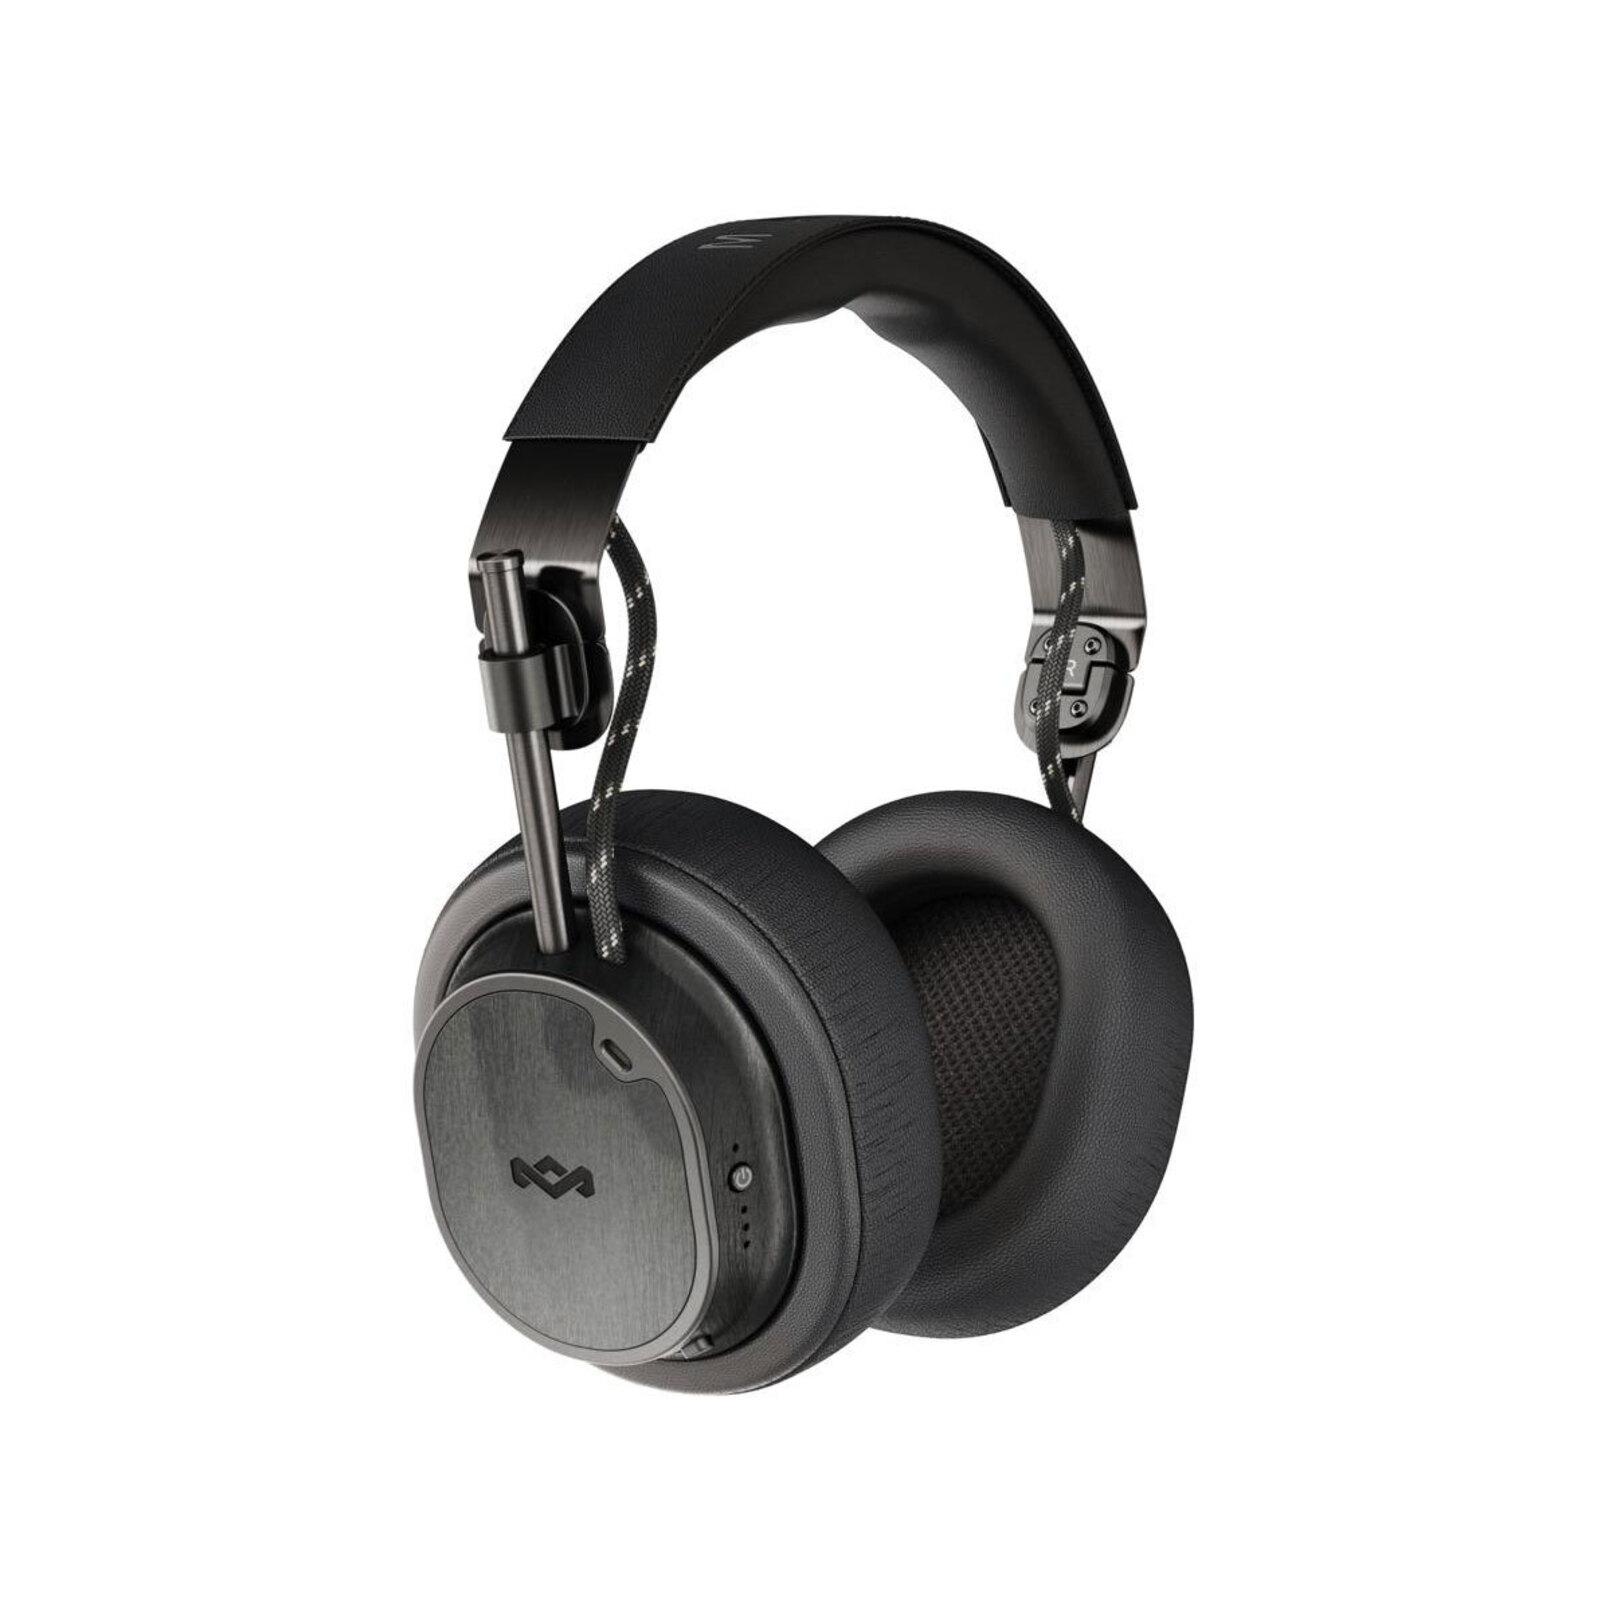 House of Marley ANC Noise Cancelling Bluetooth 5.0 Headphones w/Mic Black Exodus